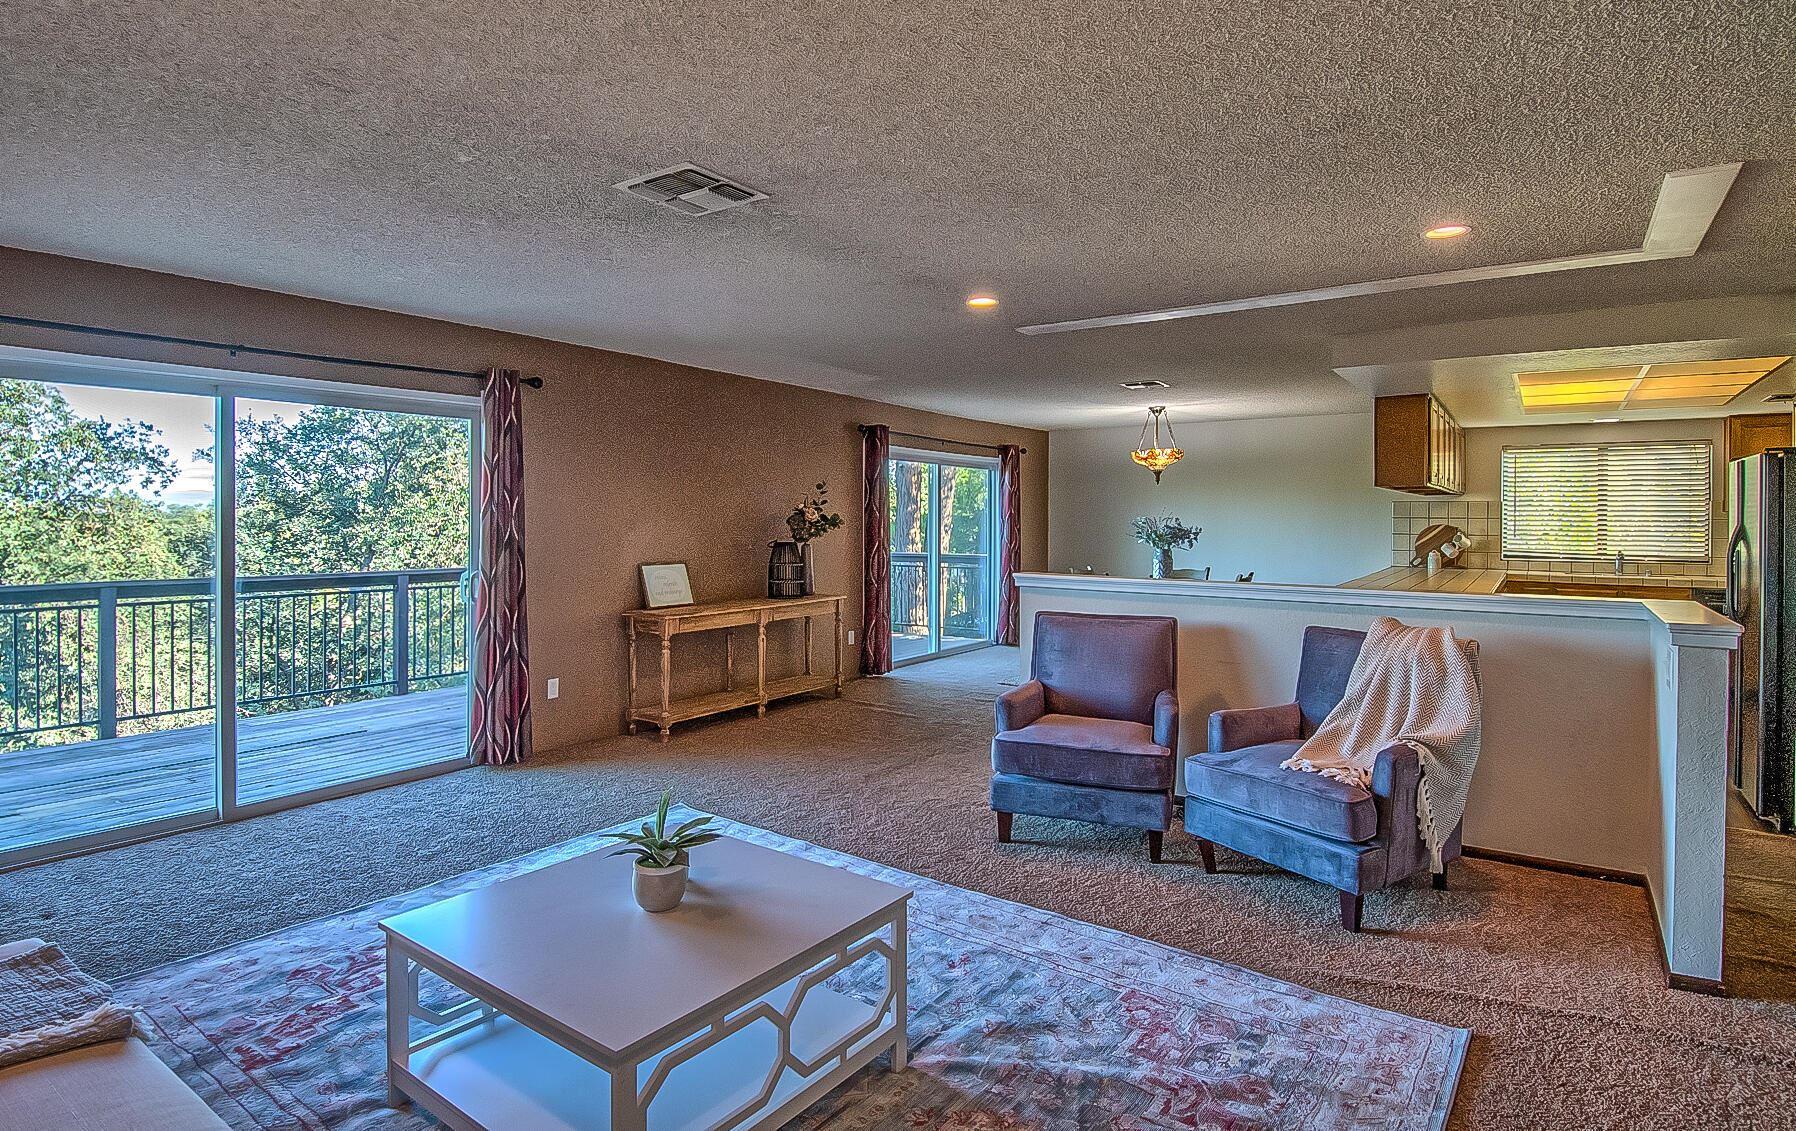 Photo of 2215 Oak Ridge Dr, Redding, CA 96001 (MLS # 21-4873)